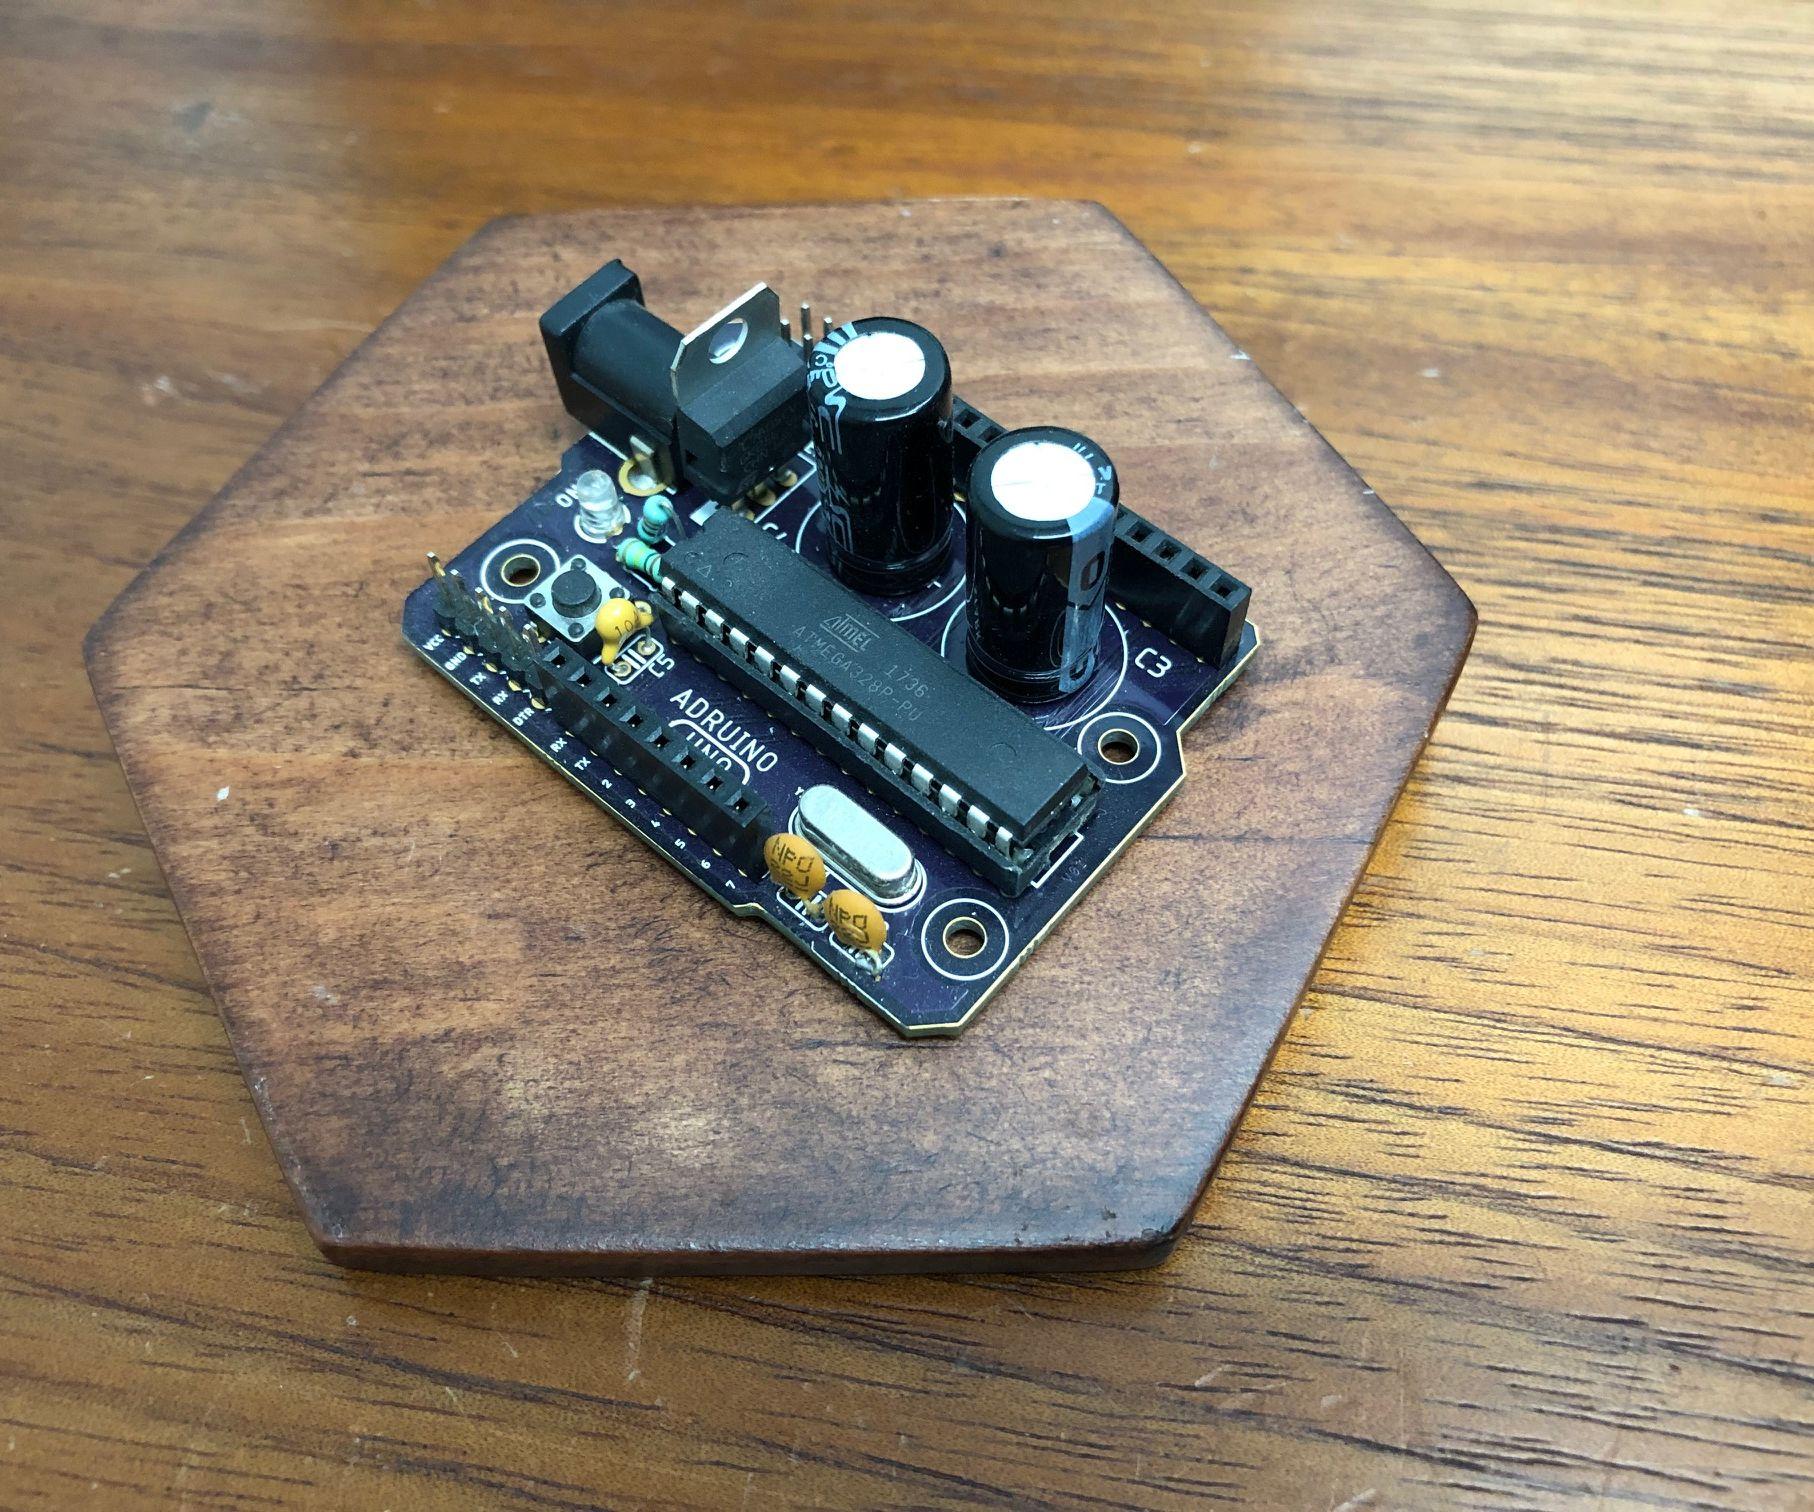 DIY Adruino PCB